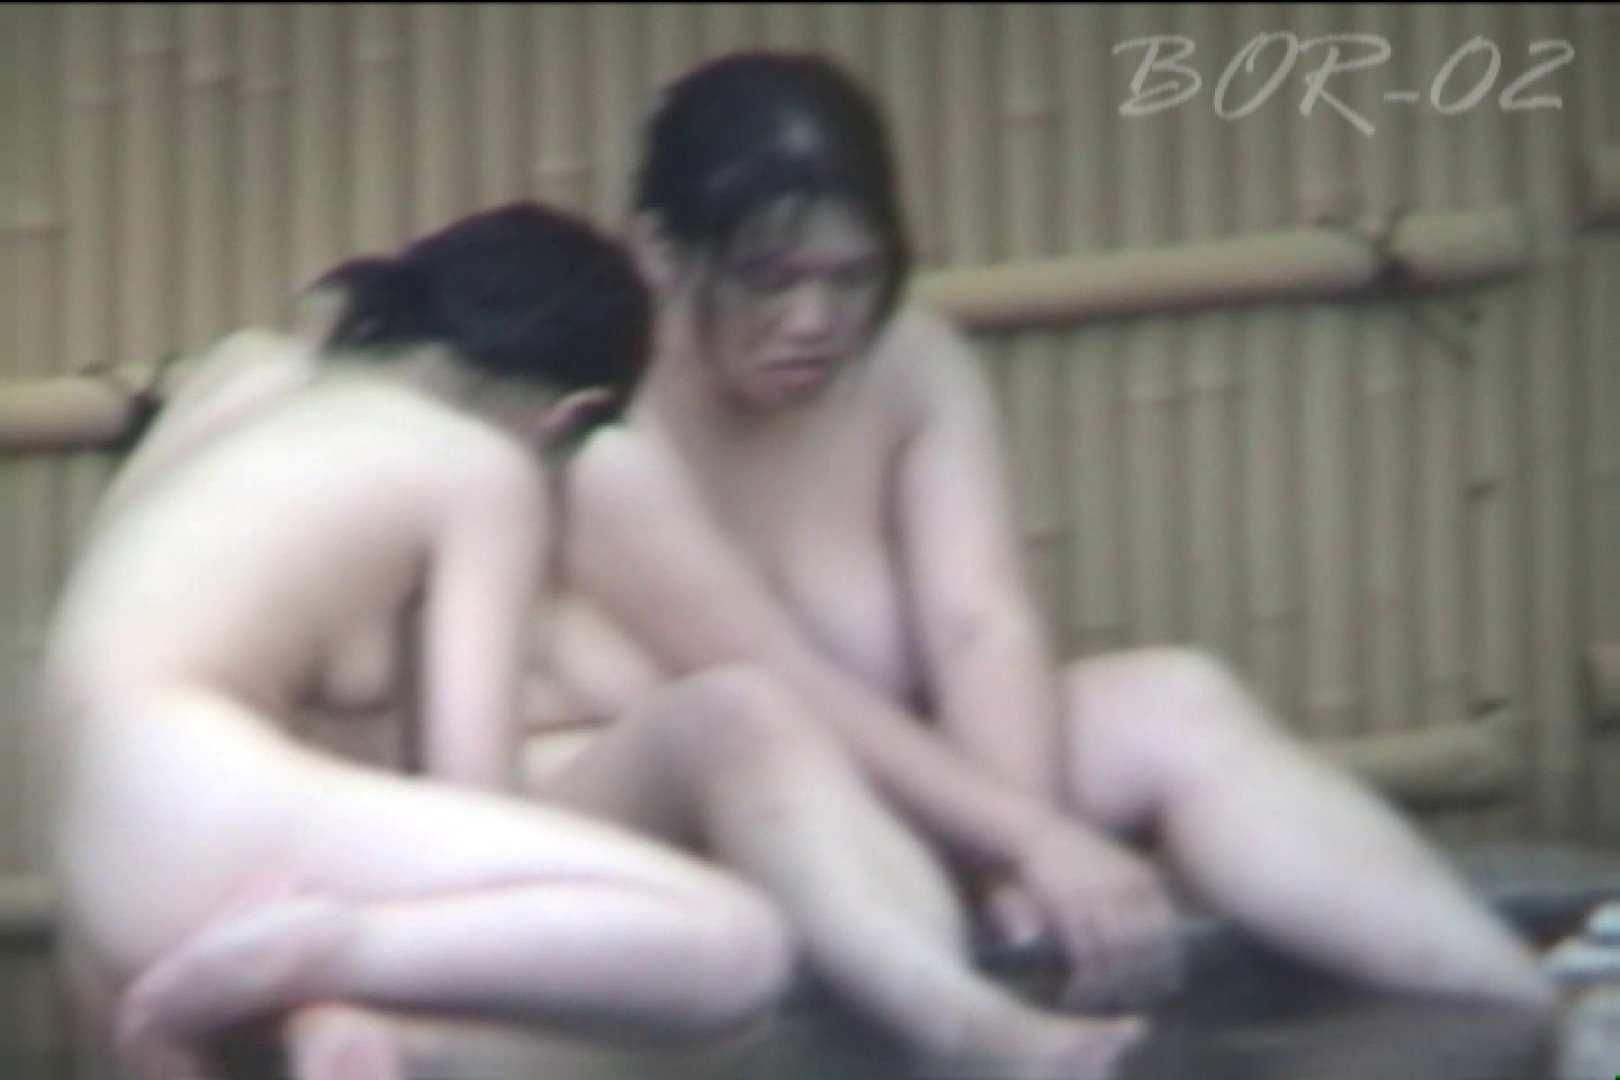 Aquaな露天風呂Vol.471 露天風呂   OLのエロ生活  23連発 10